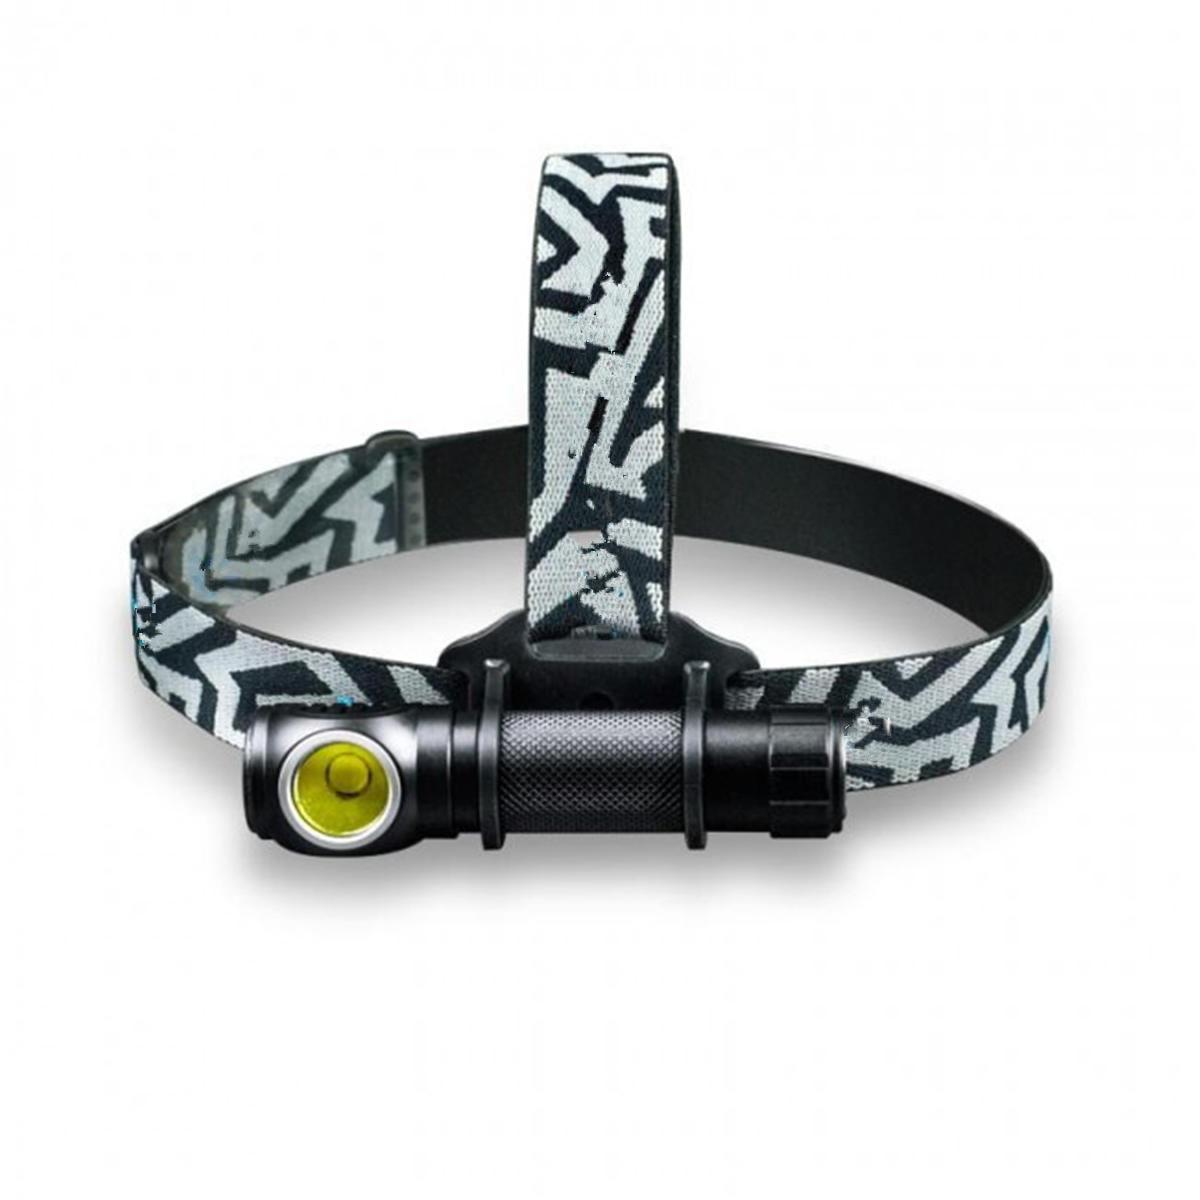 HR70 XHP70.2 3000LM Brightness Magnetic USB Charge Handheld Flashlight Hiking Light Charge LED Flashlight 2018 NEWHR70 XHP70.2 3000LM Brightness Magnetic USB Charge Handheld Flashlight Hiking Light Charge LED Flashlight 2018 NEW